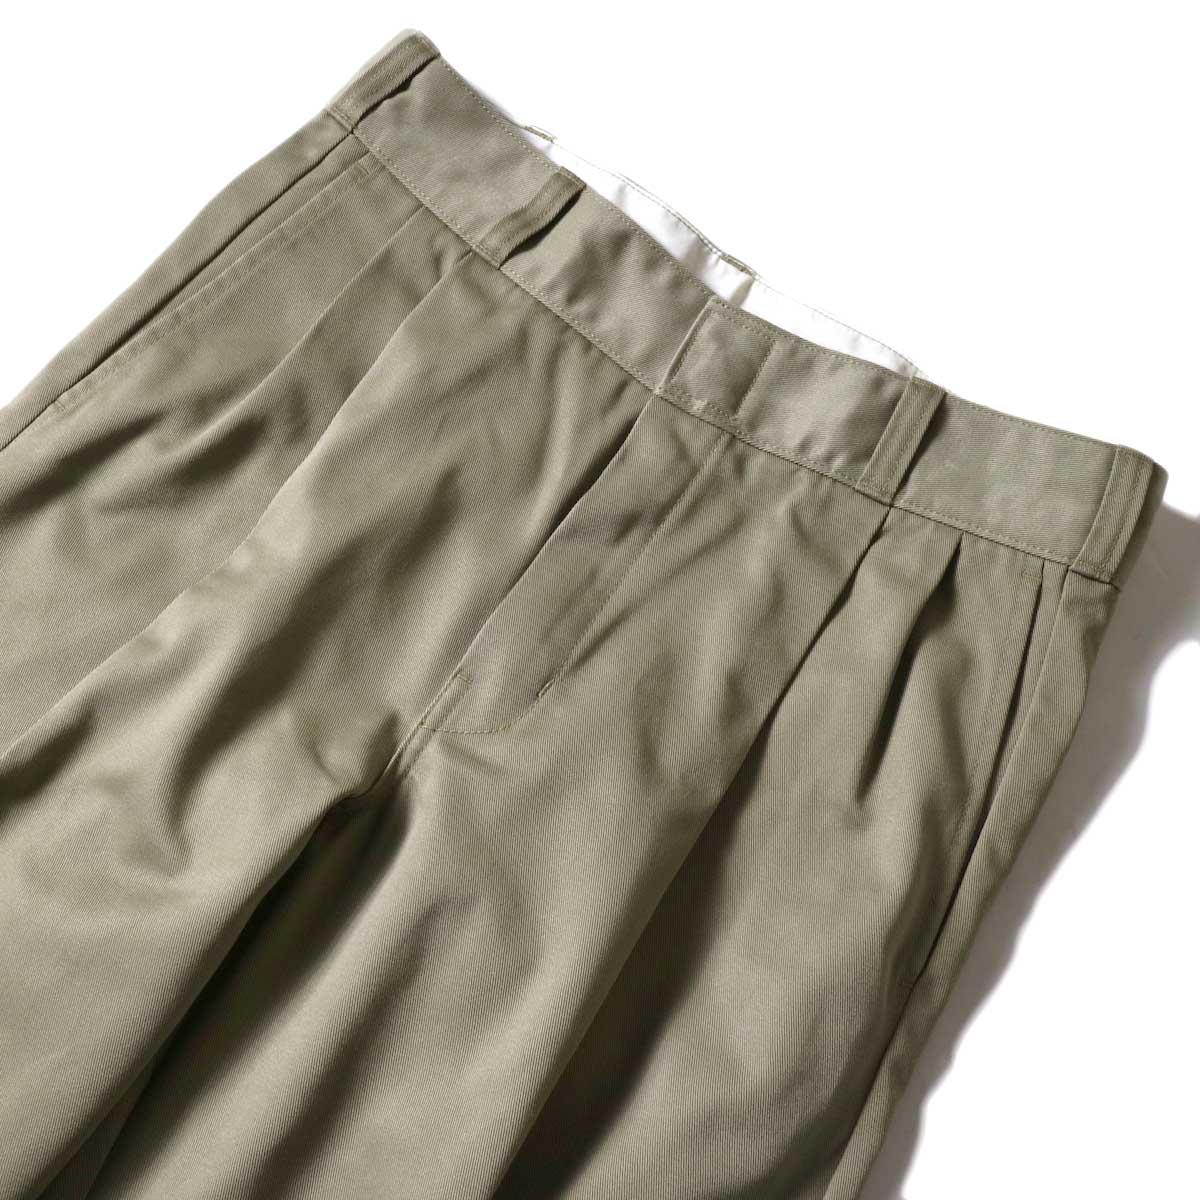 UNUSED / UW0913 Unused x Dickies  2Tuck Pants (Beige) 2タック